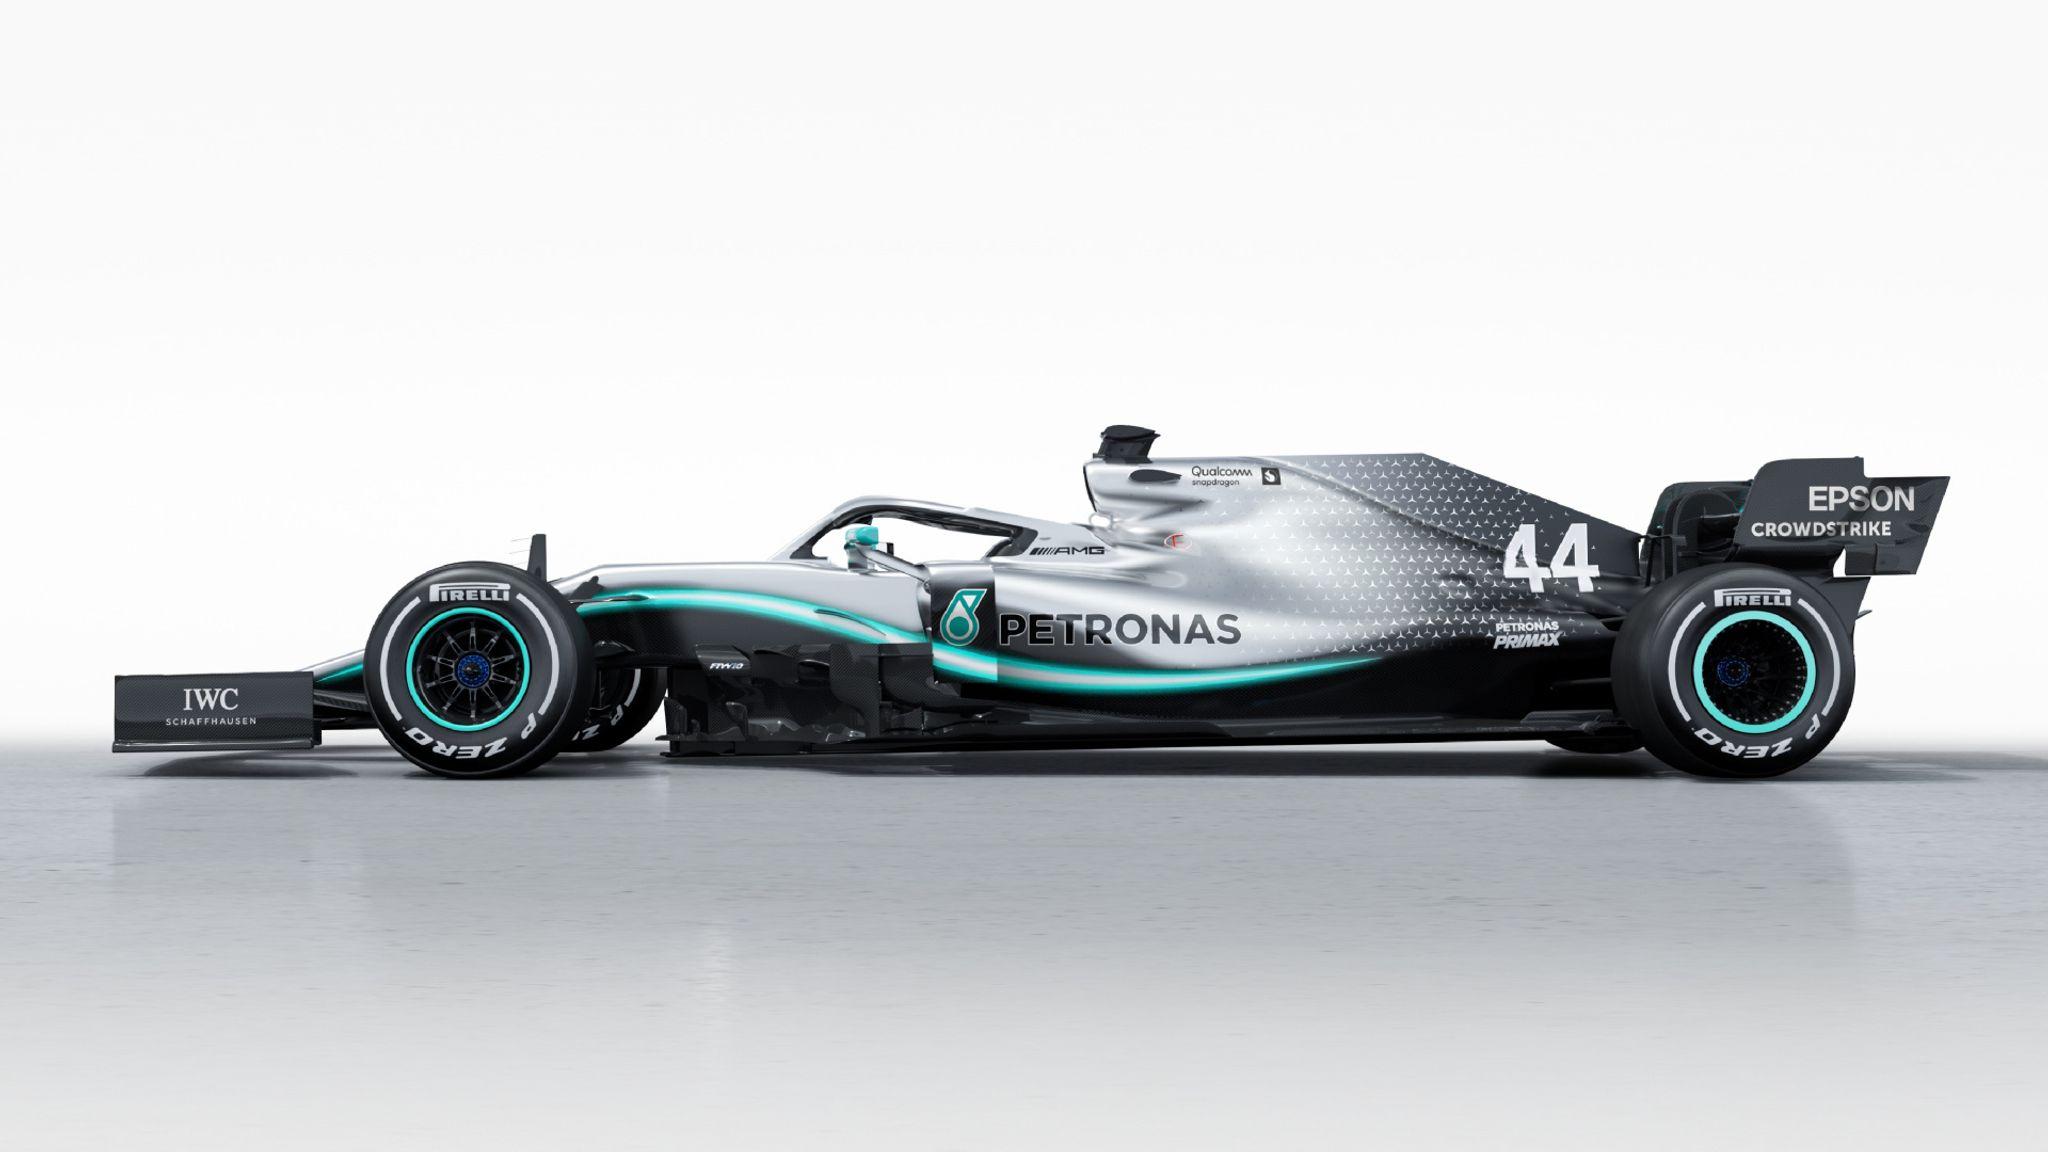 Mercedes launch new 2019 Formula 1 car | F1 News